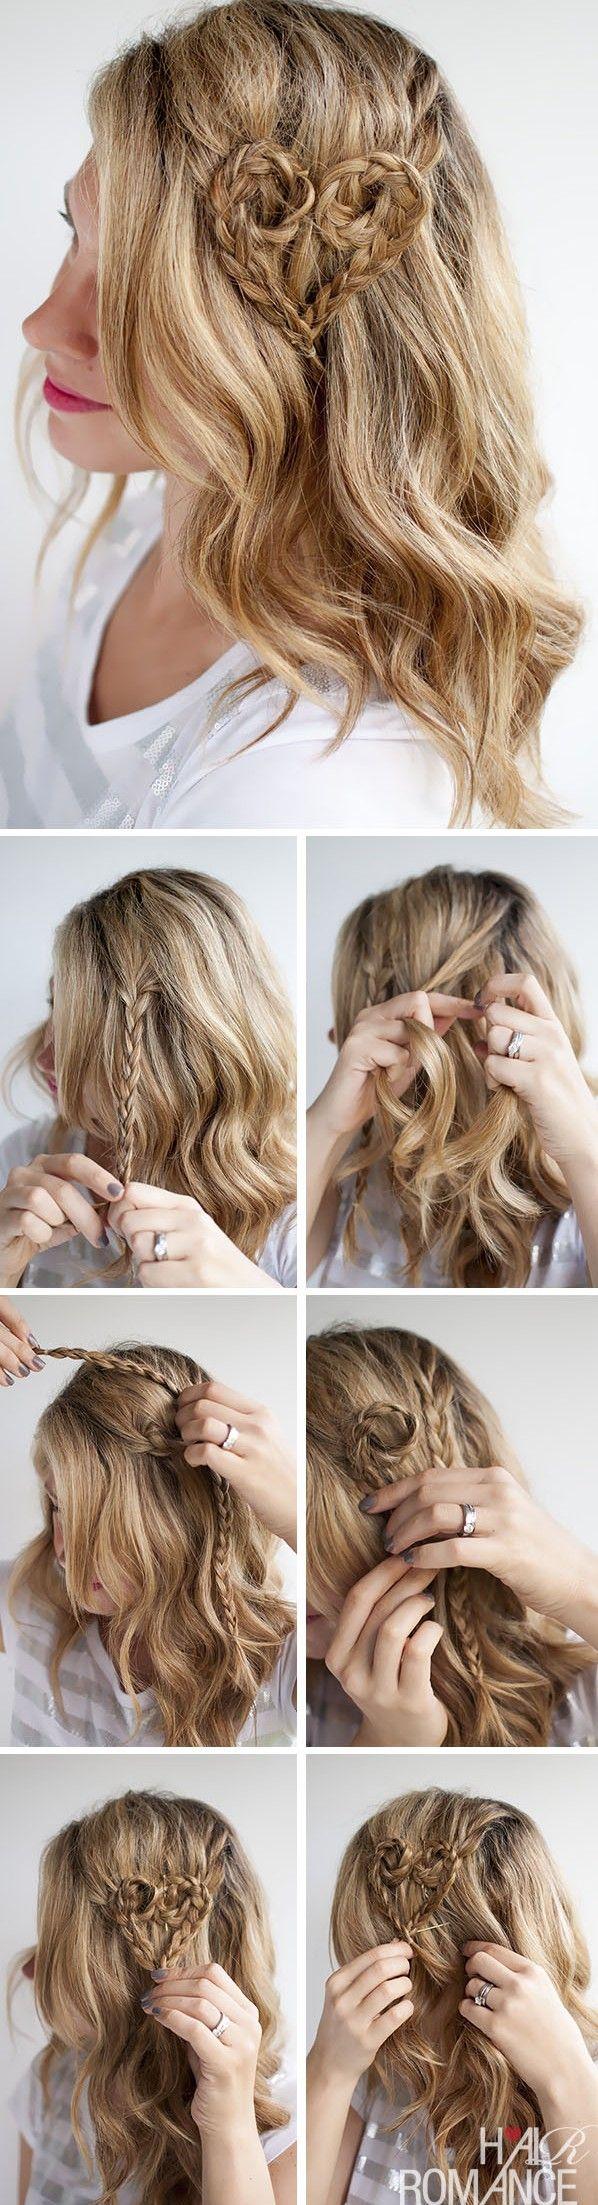 promhairstylesstepbystepprom  hair inspiration